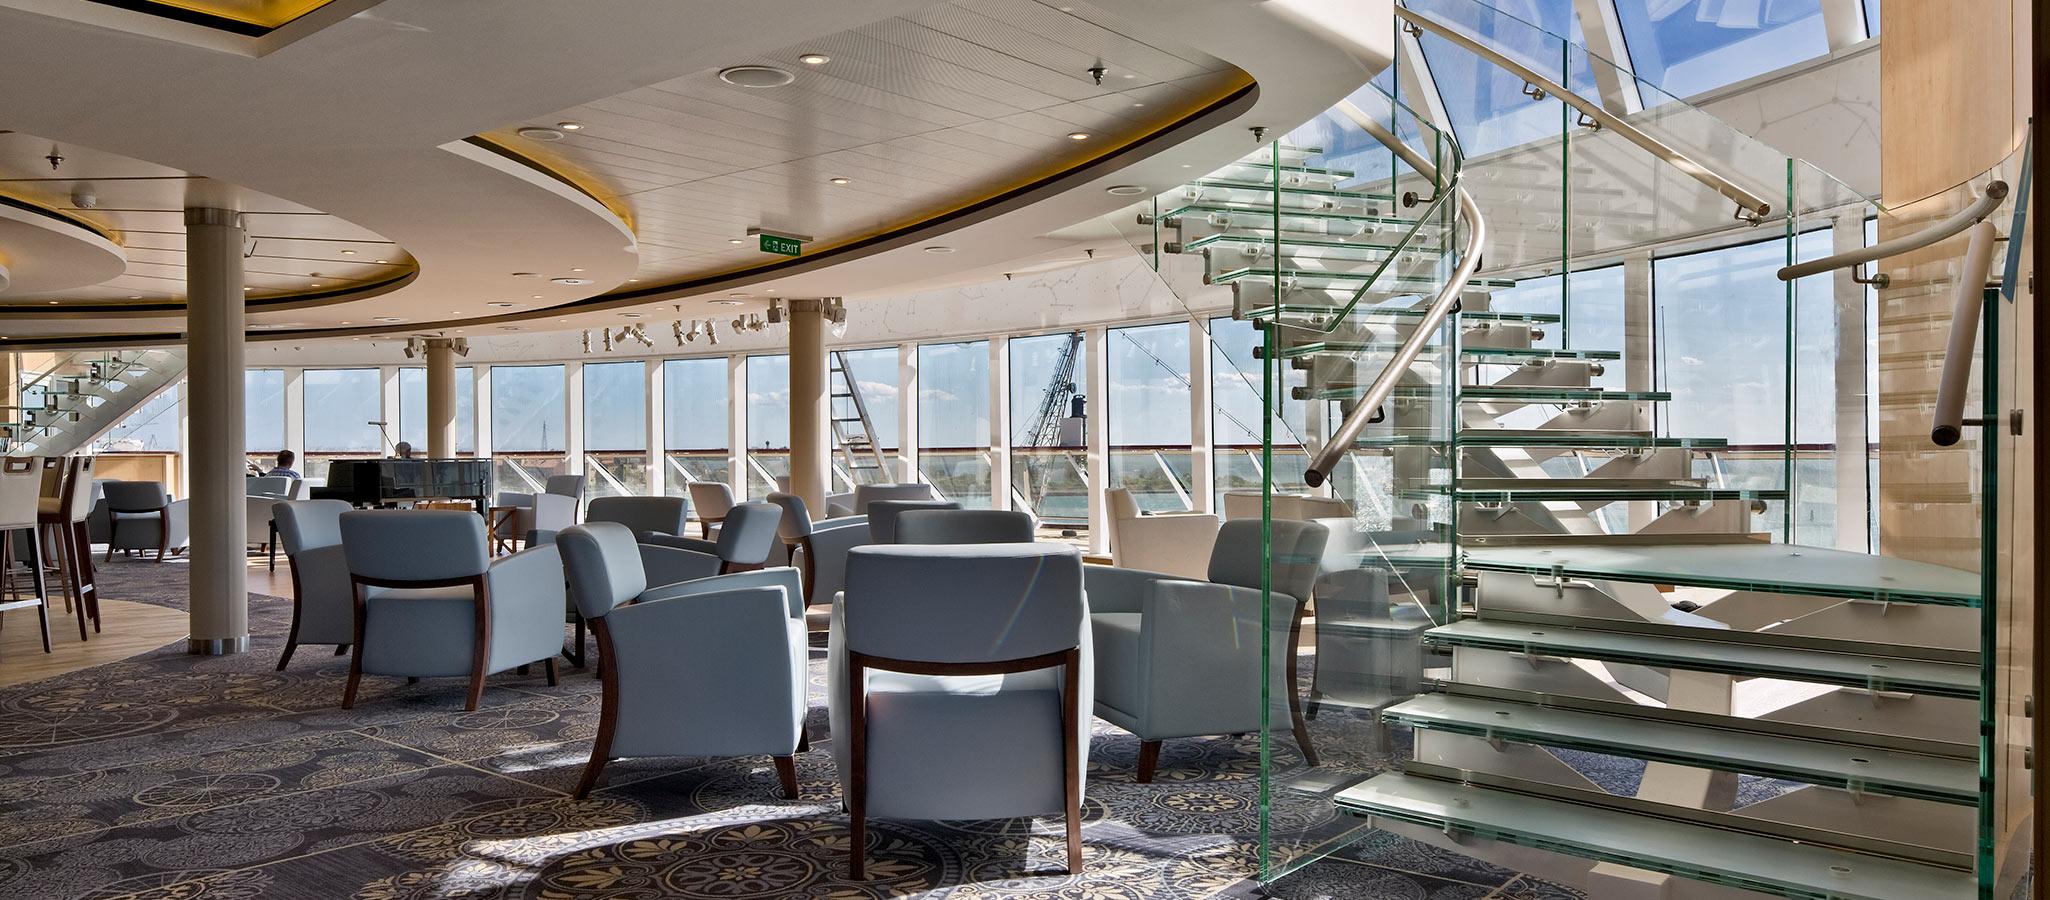 Meeting-Location mit Ausblick: Die Observation Lounge